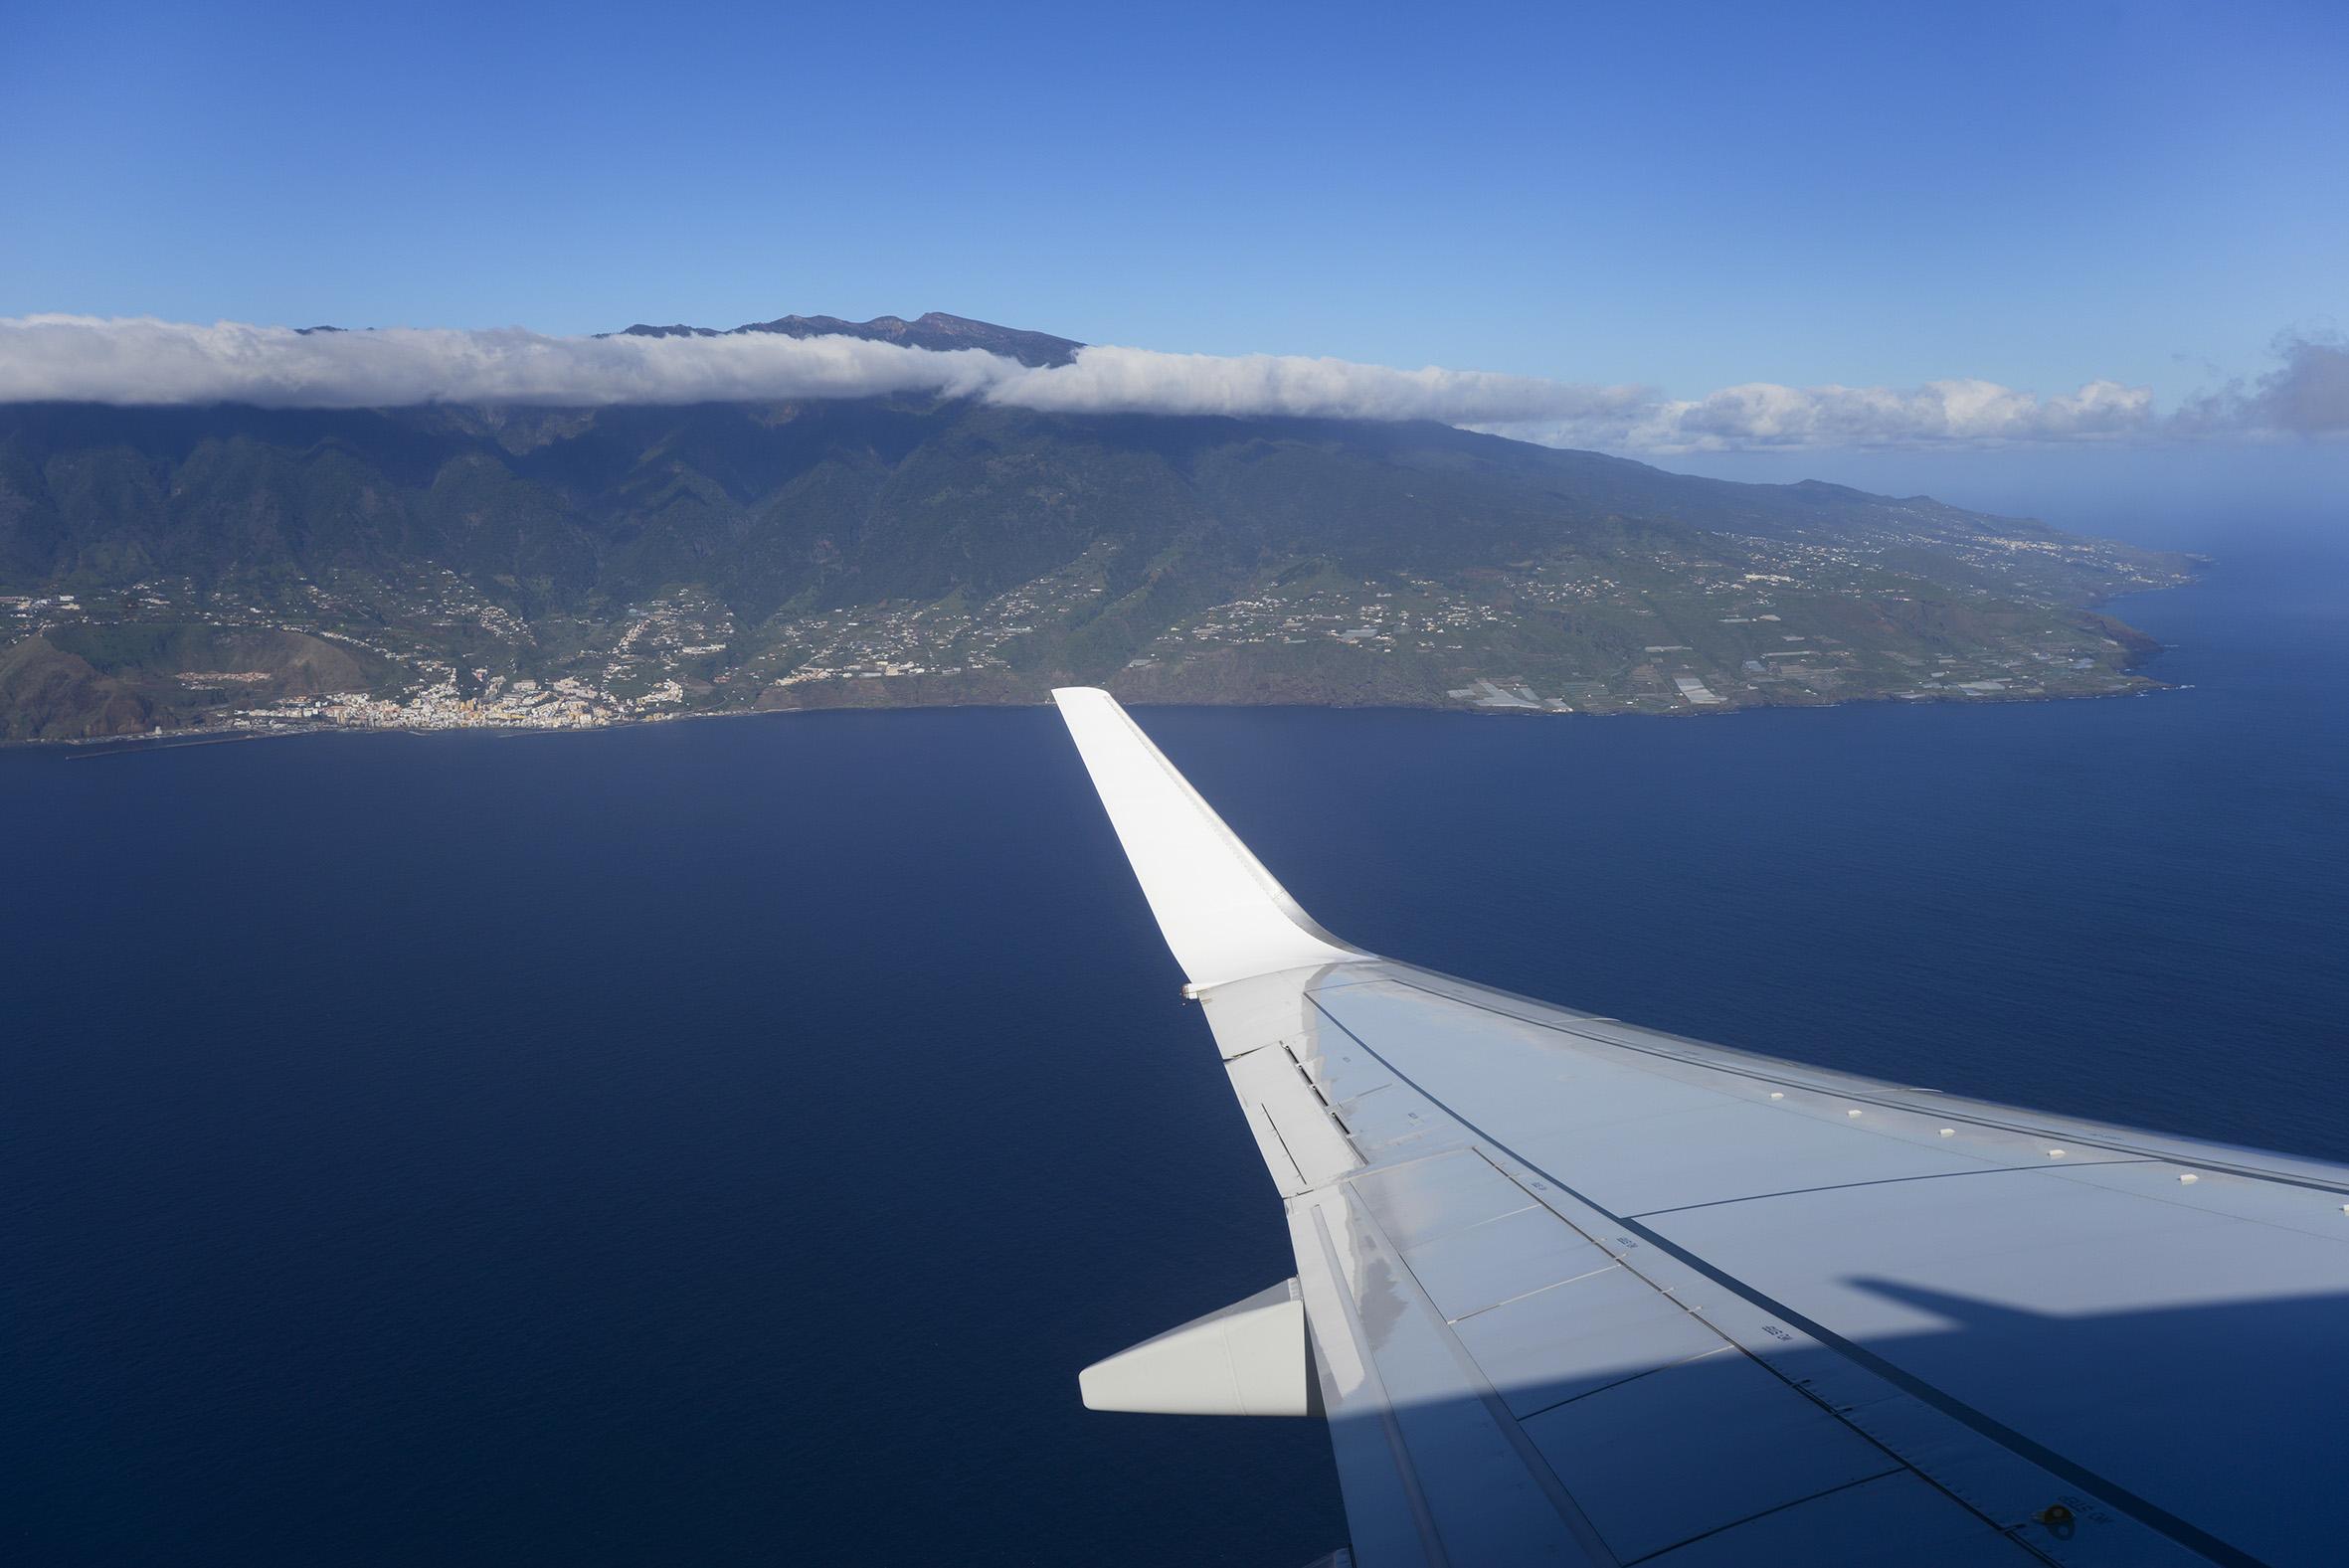 La Palma Island, Spain